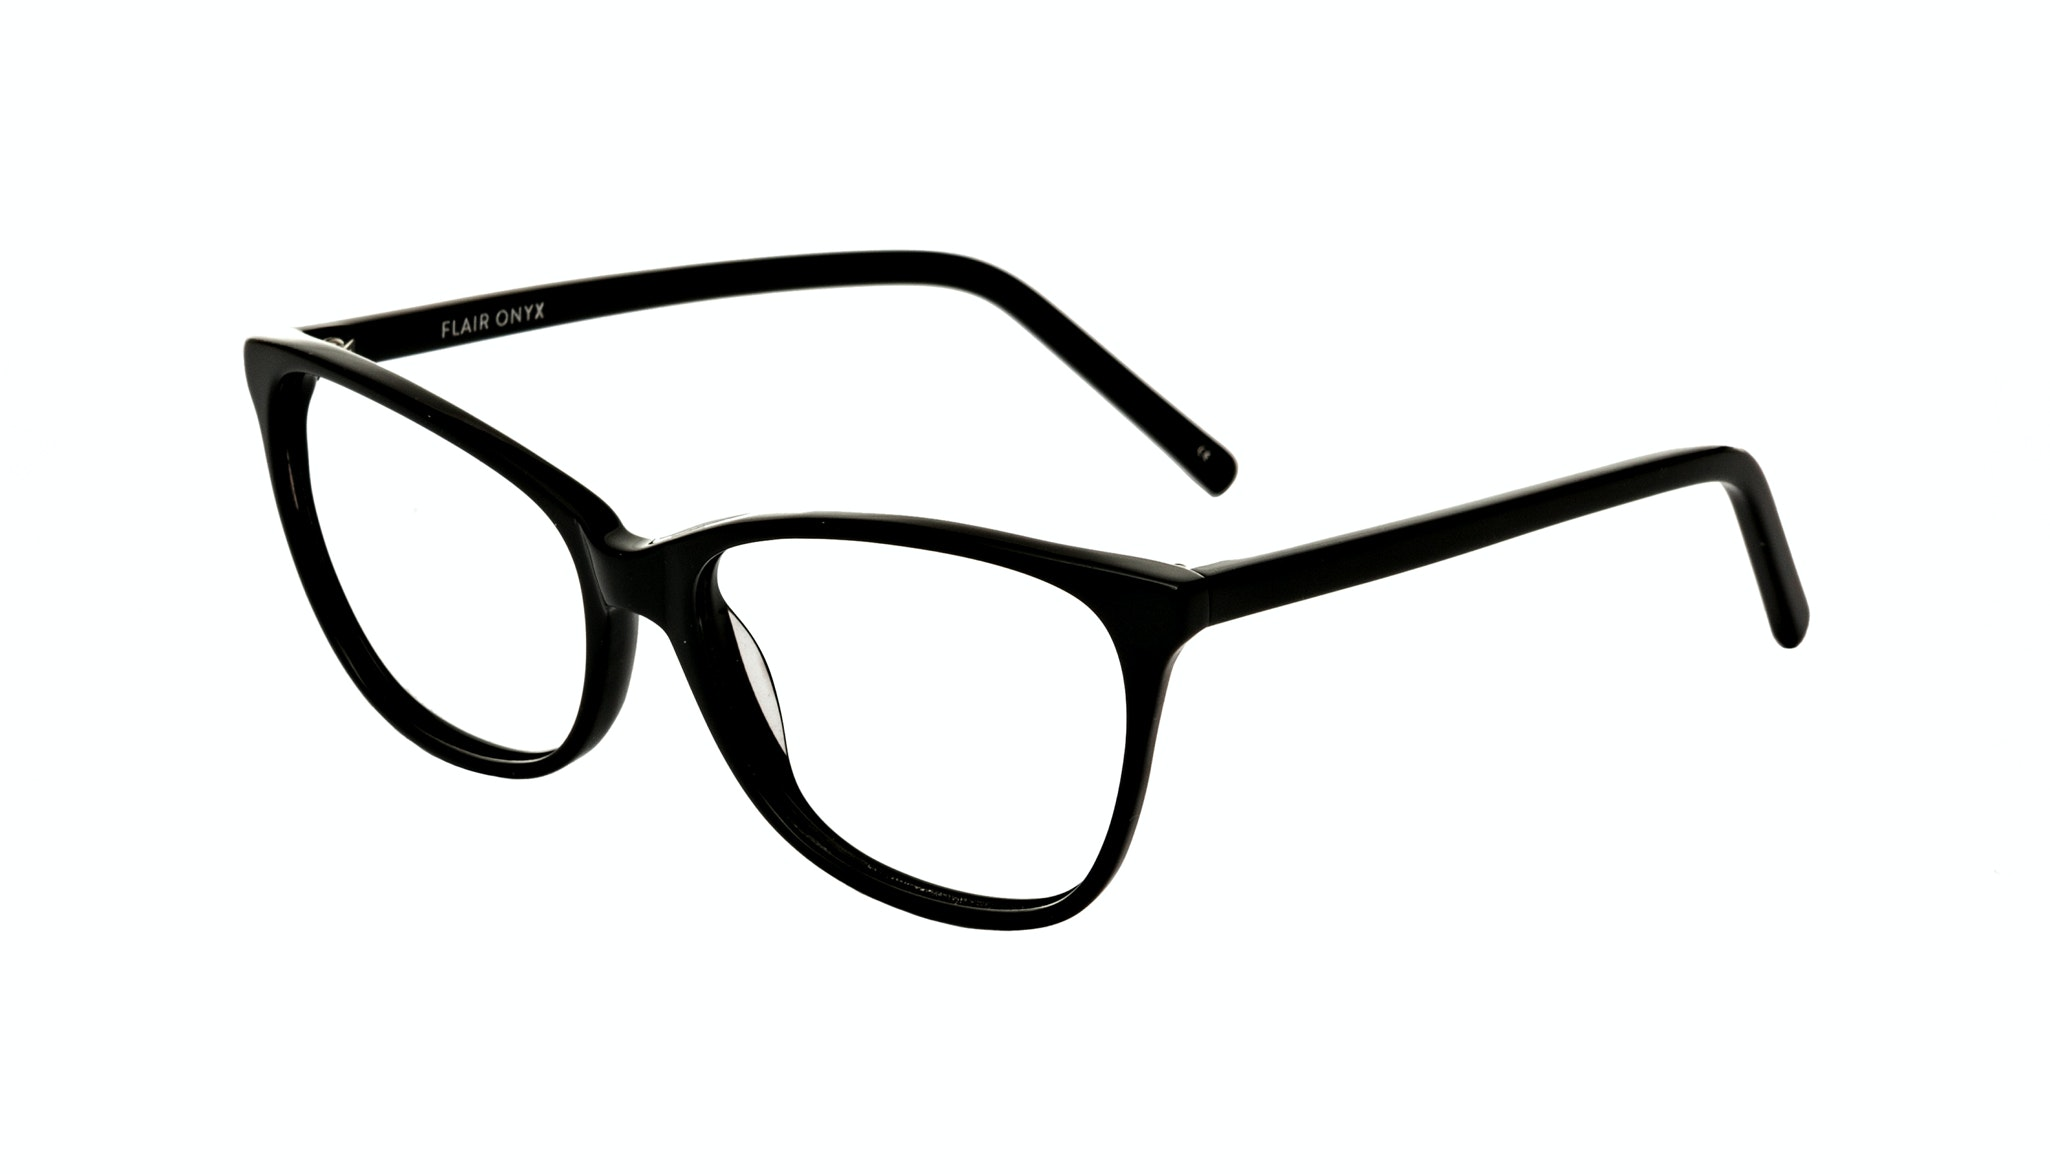 Affordable Fashion Glasses Cat Eye Eyeglasses Women Flair Onyx Tilt